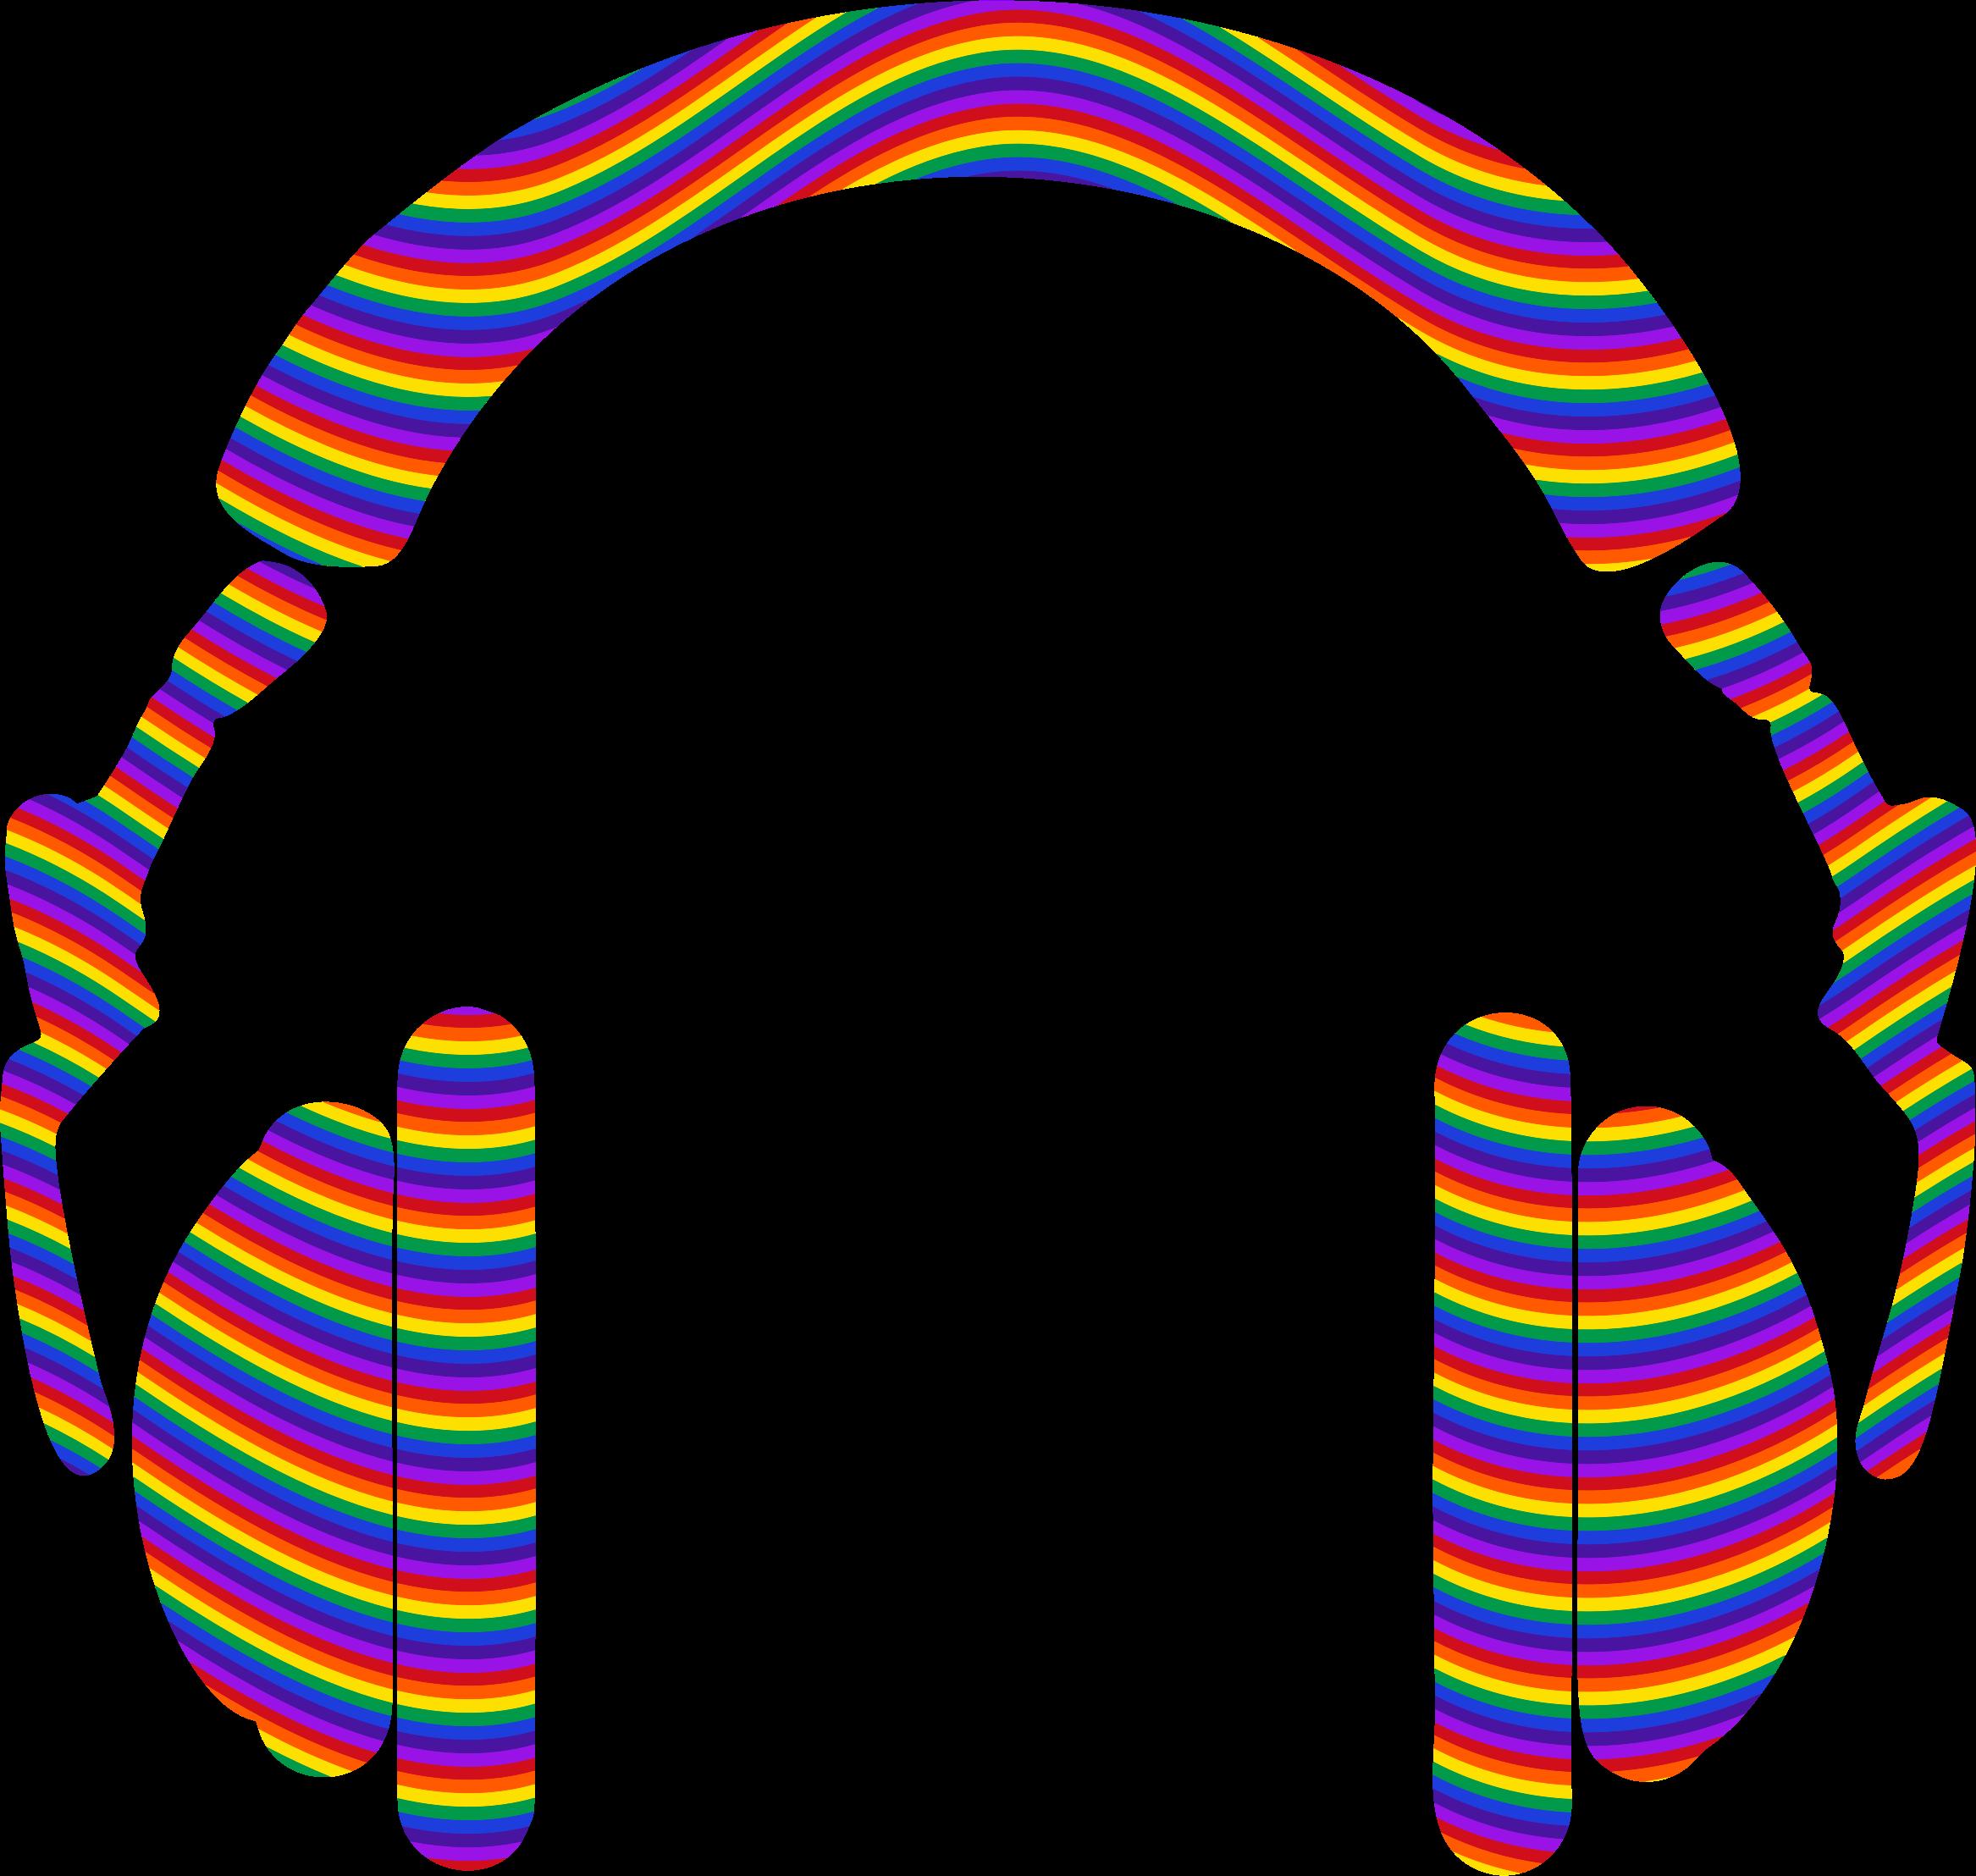 Headphones big image png. Waves clipart rainbow